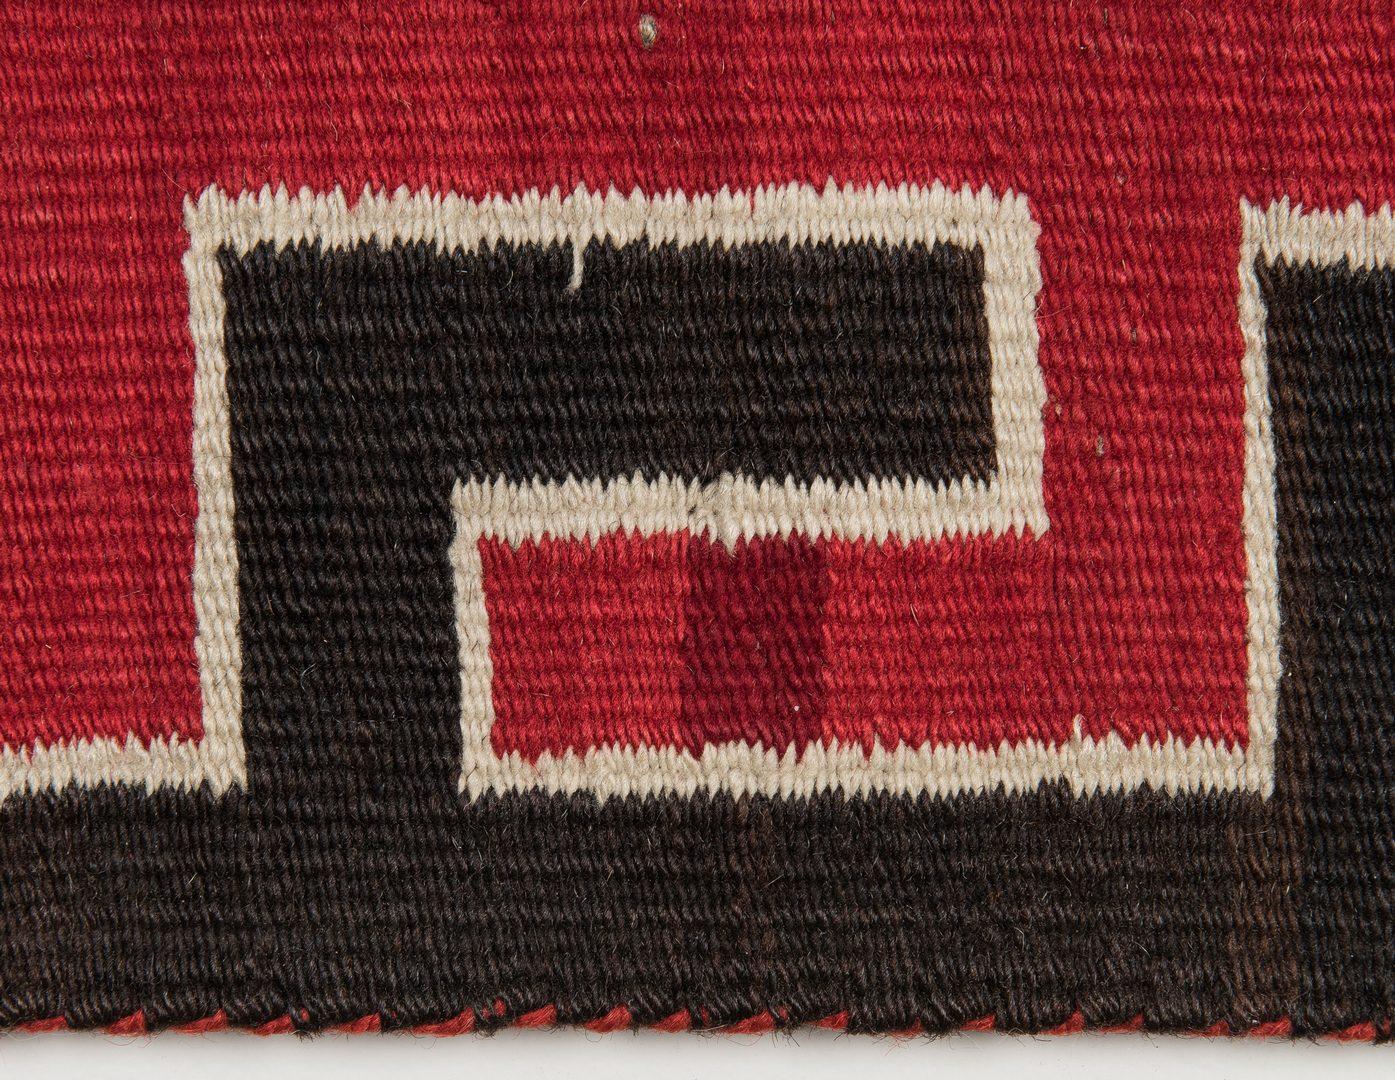 Lot 588: Navajo Yei Rug, 4.4 x 3.5, c. 1920